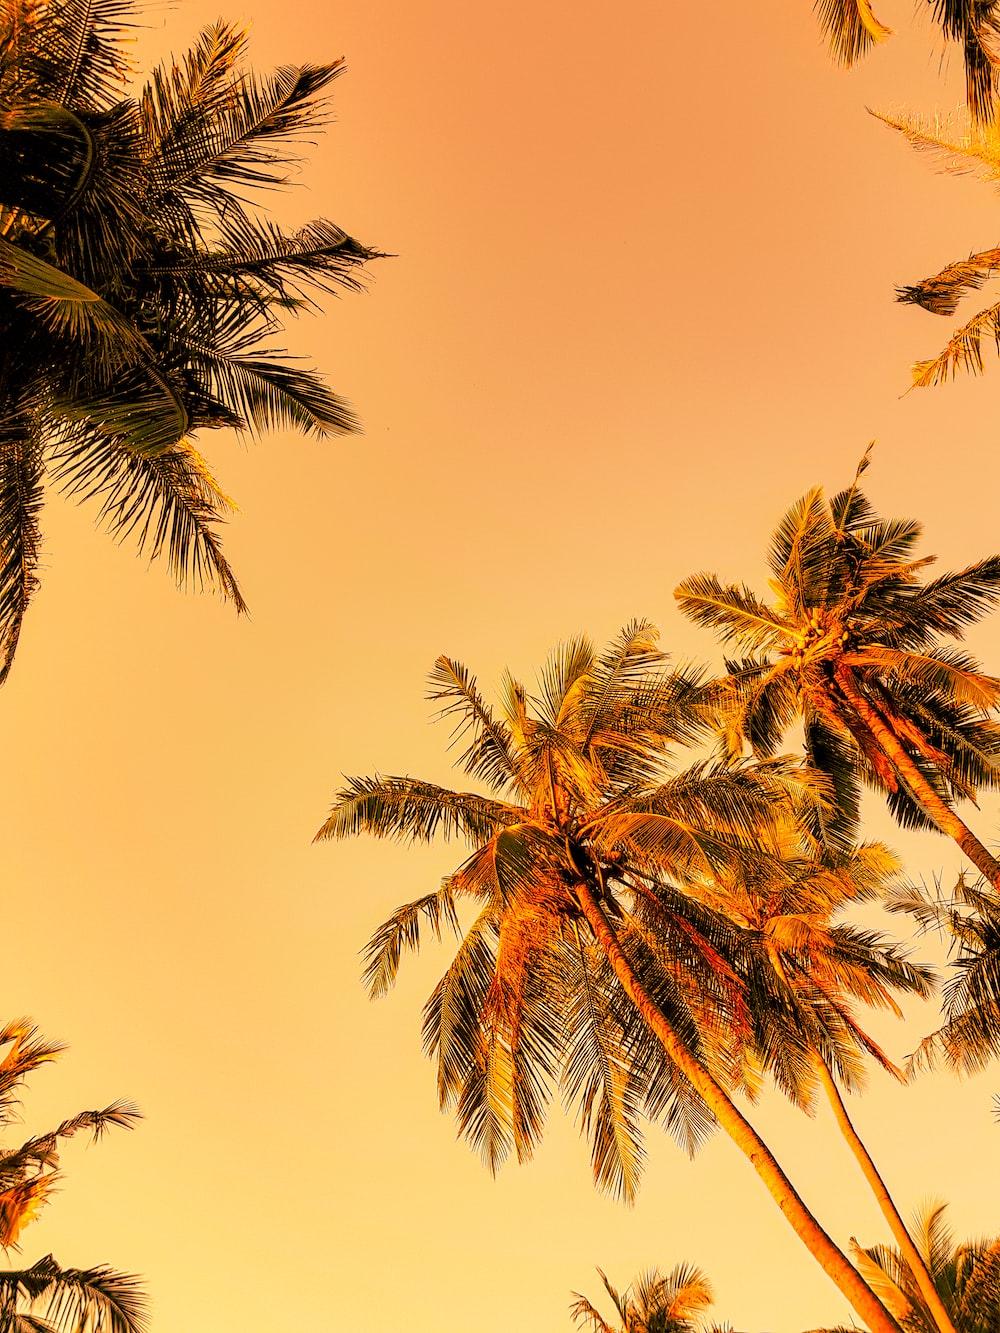 green palm tree under orange sky